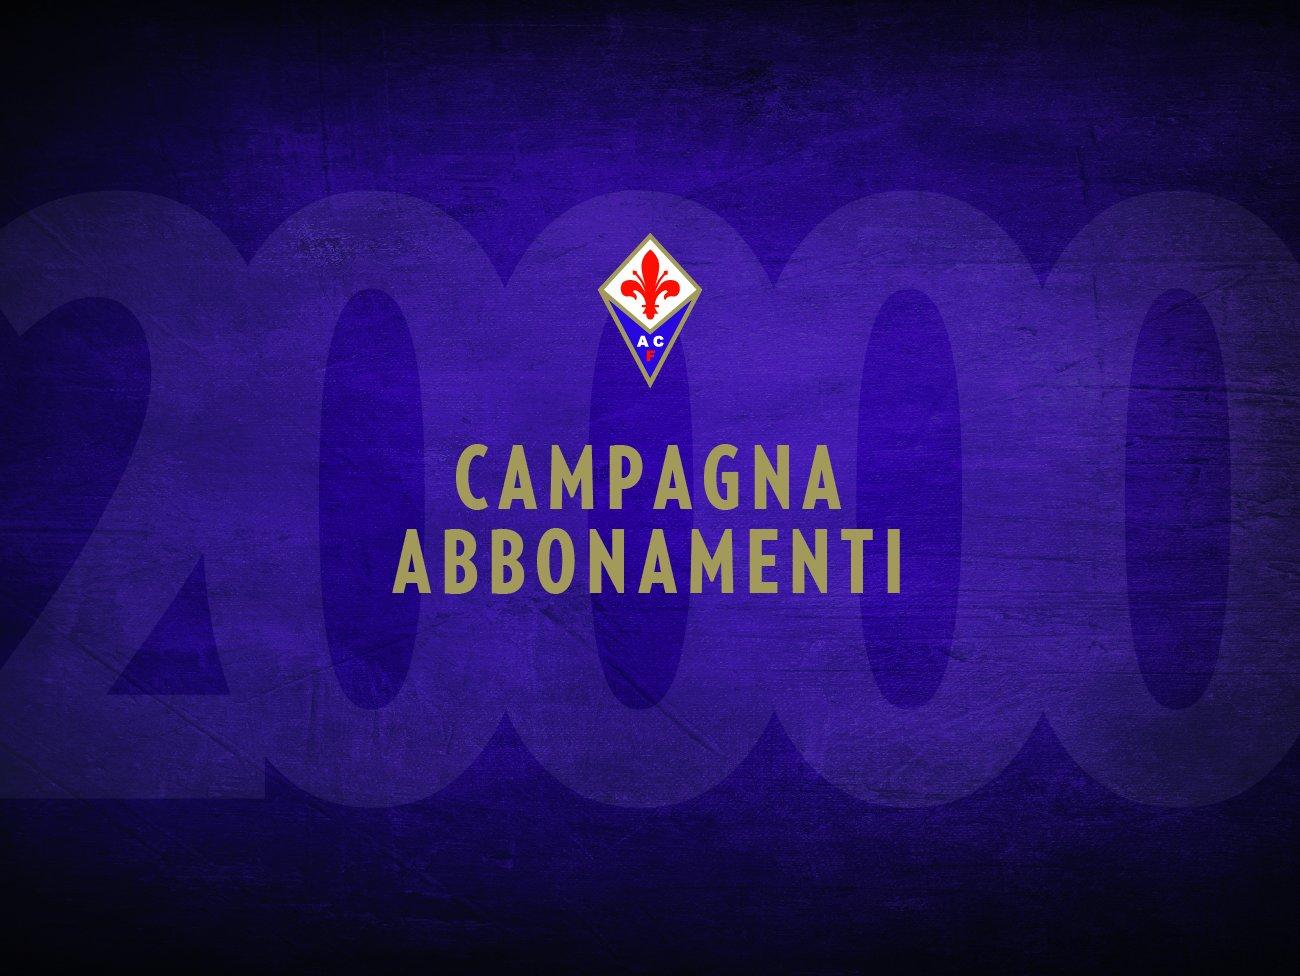 Fiorentina, superati i 20.000 abbonamenti